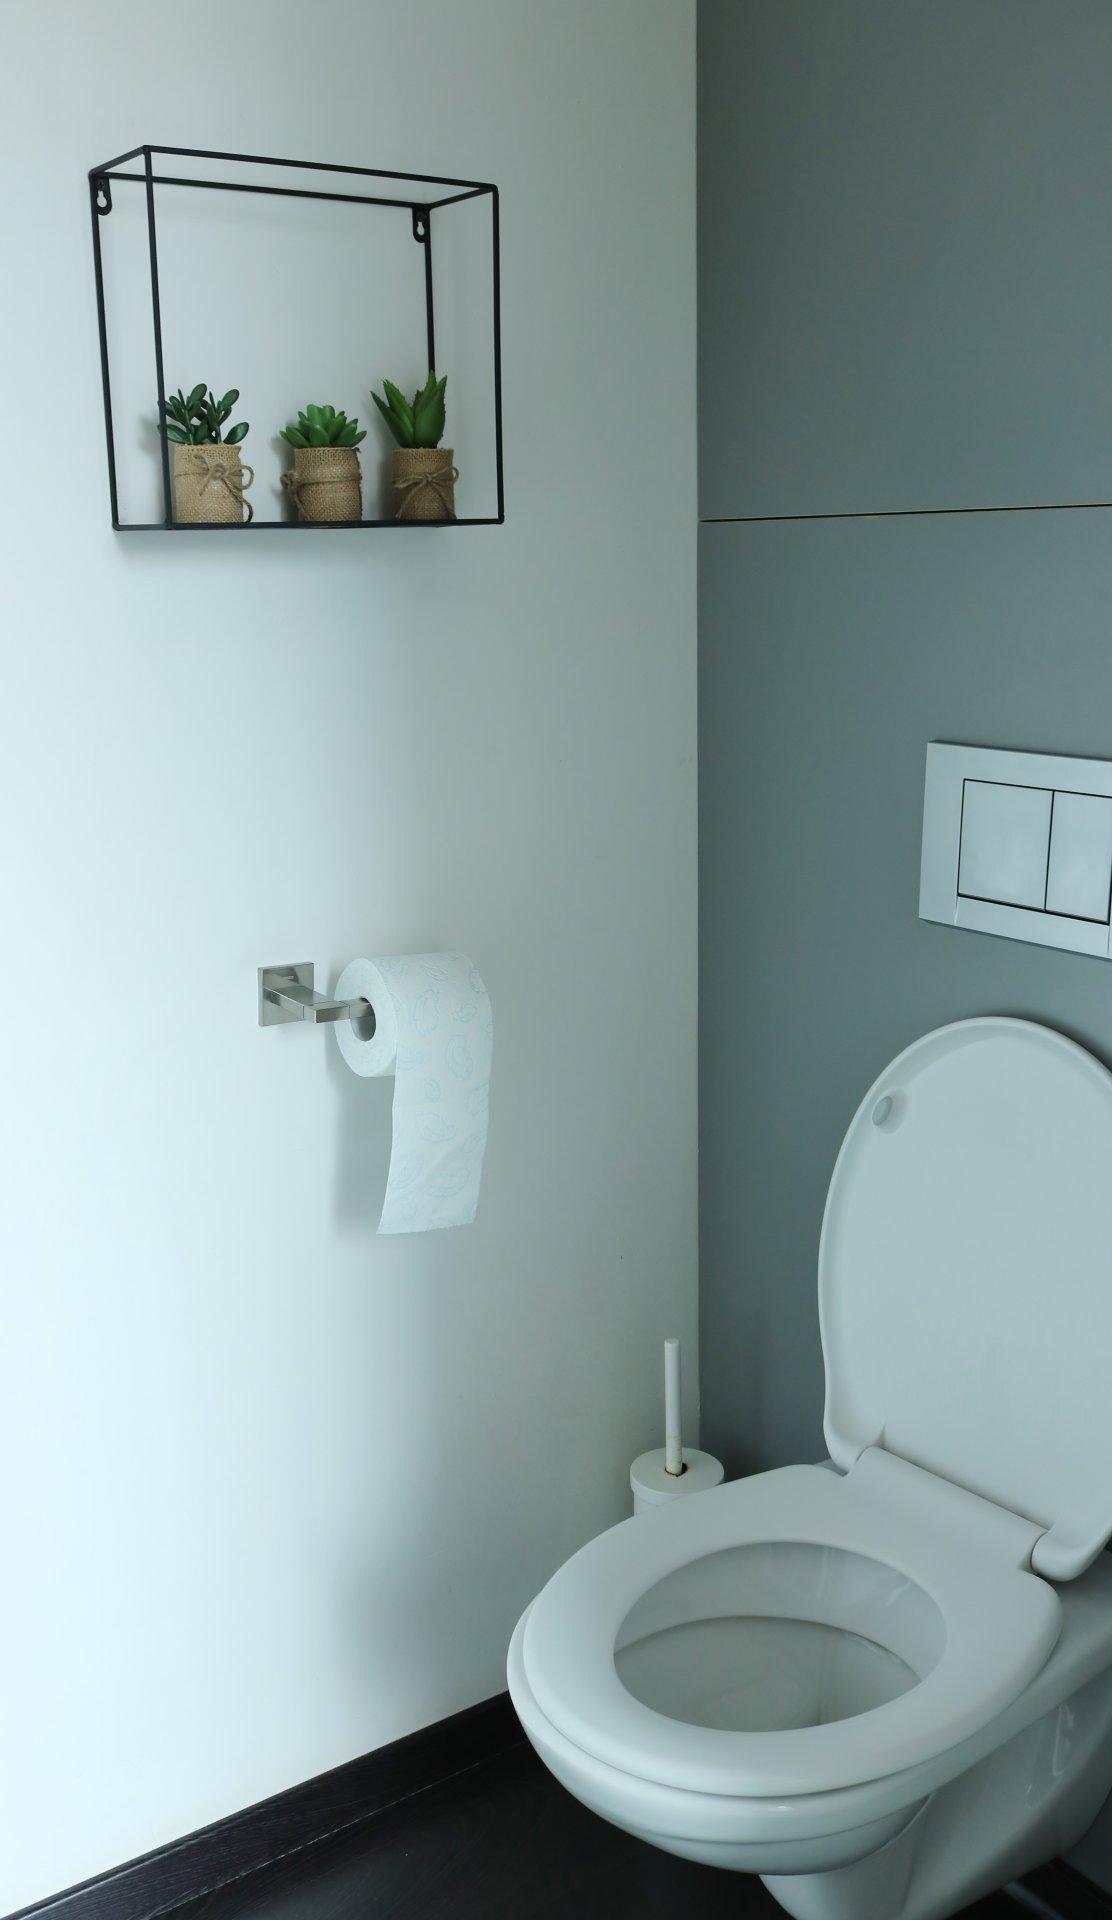 VHRNQ3202103091507/87a5e03005974c378805b958e2ef0305/14_toilet1.JPG